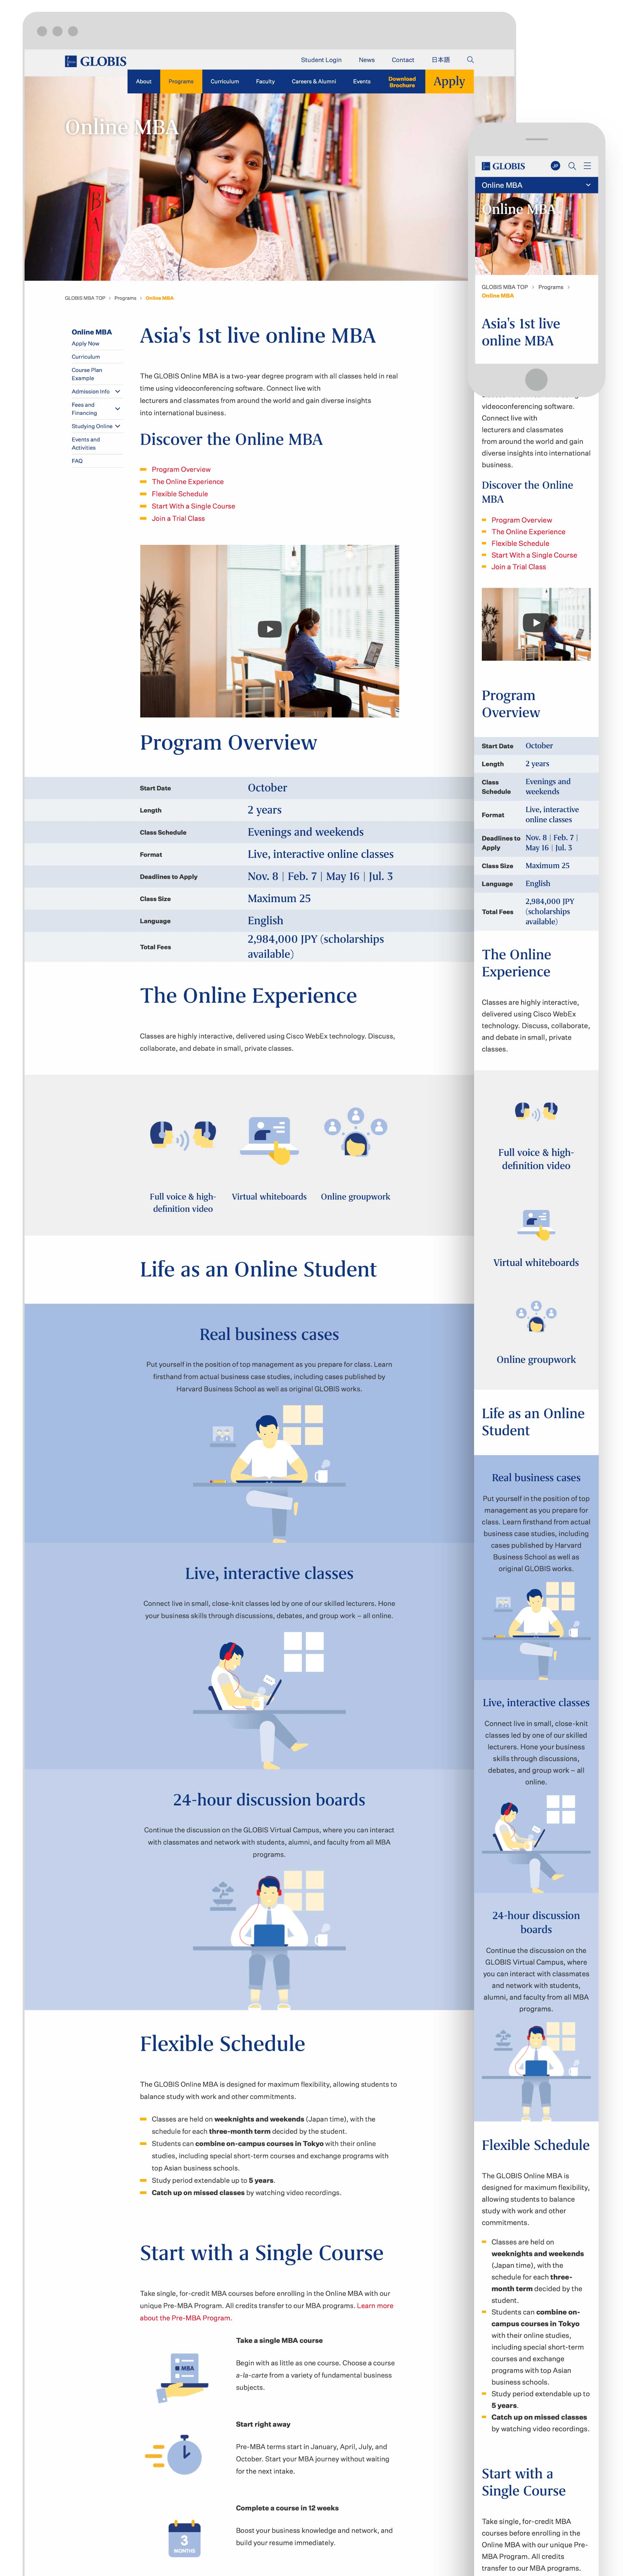 Globis University - Responsive Online MBA Program Landing Page